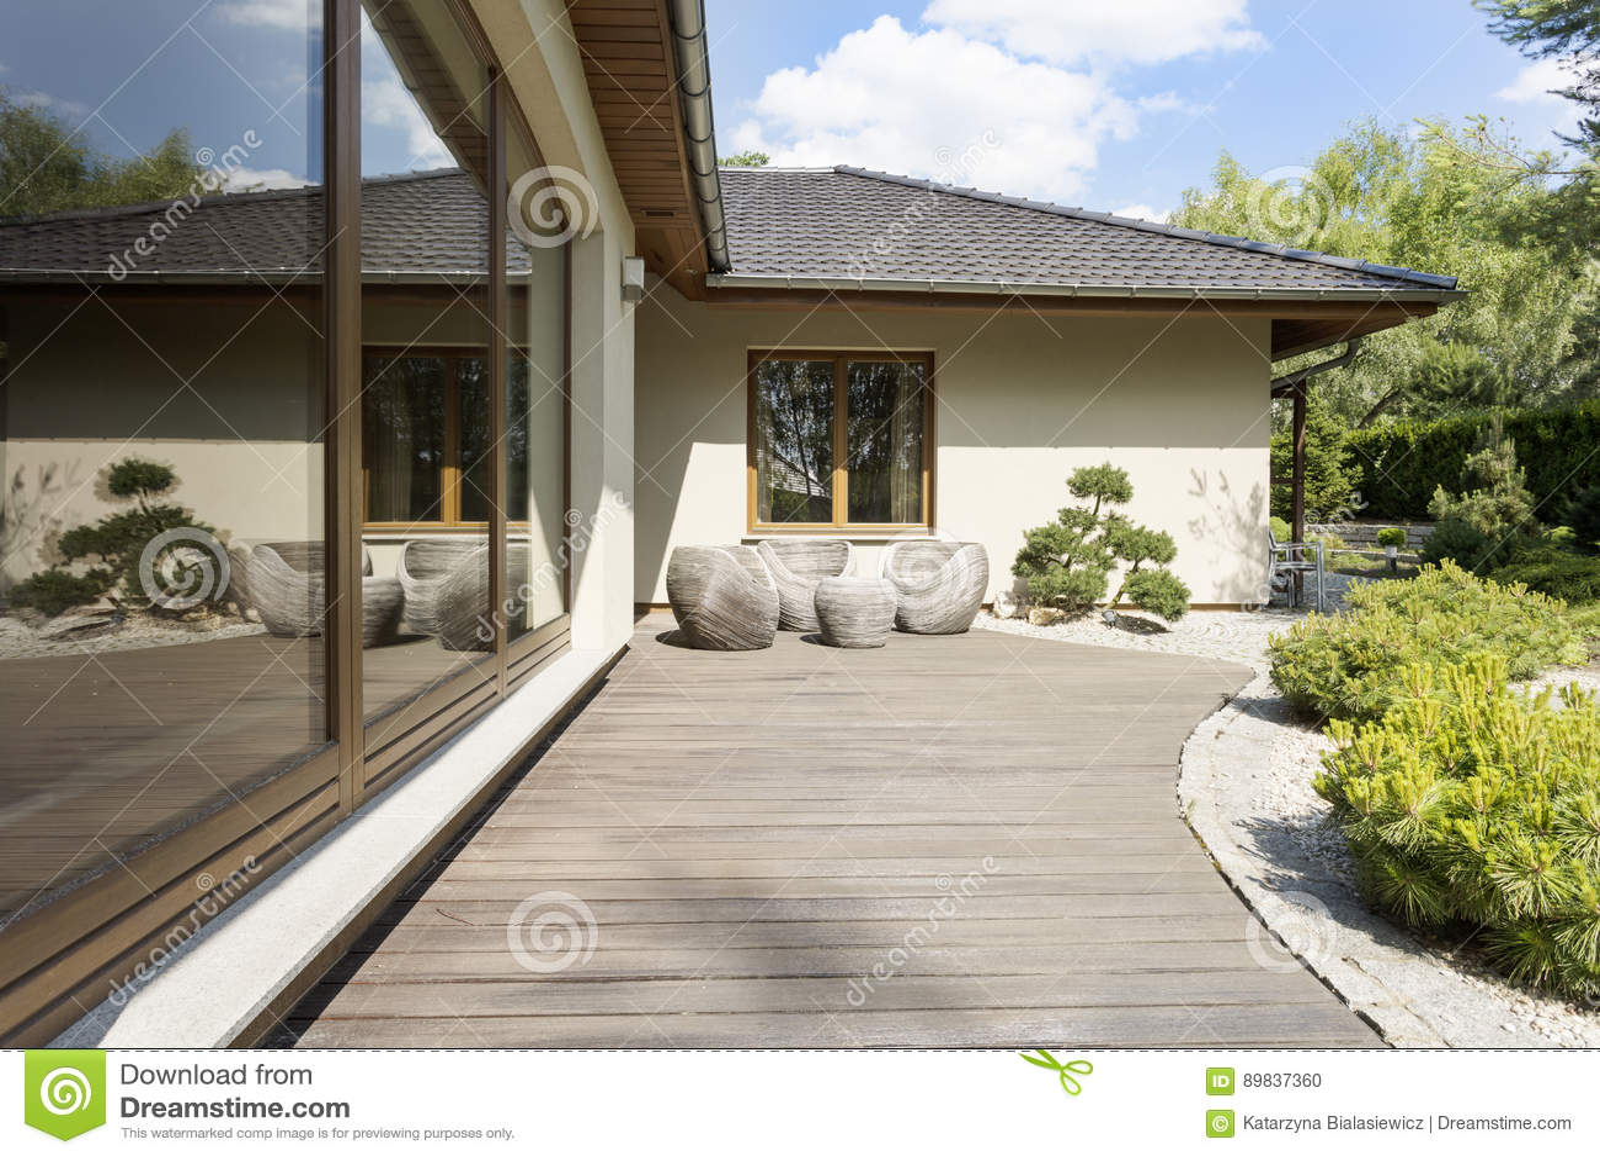 Wooden Terrace By Suburban Villa Stock Photo Image Of